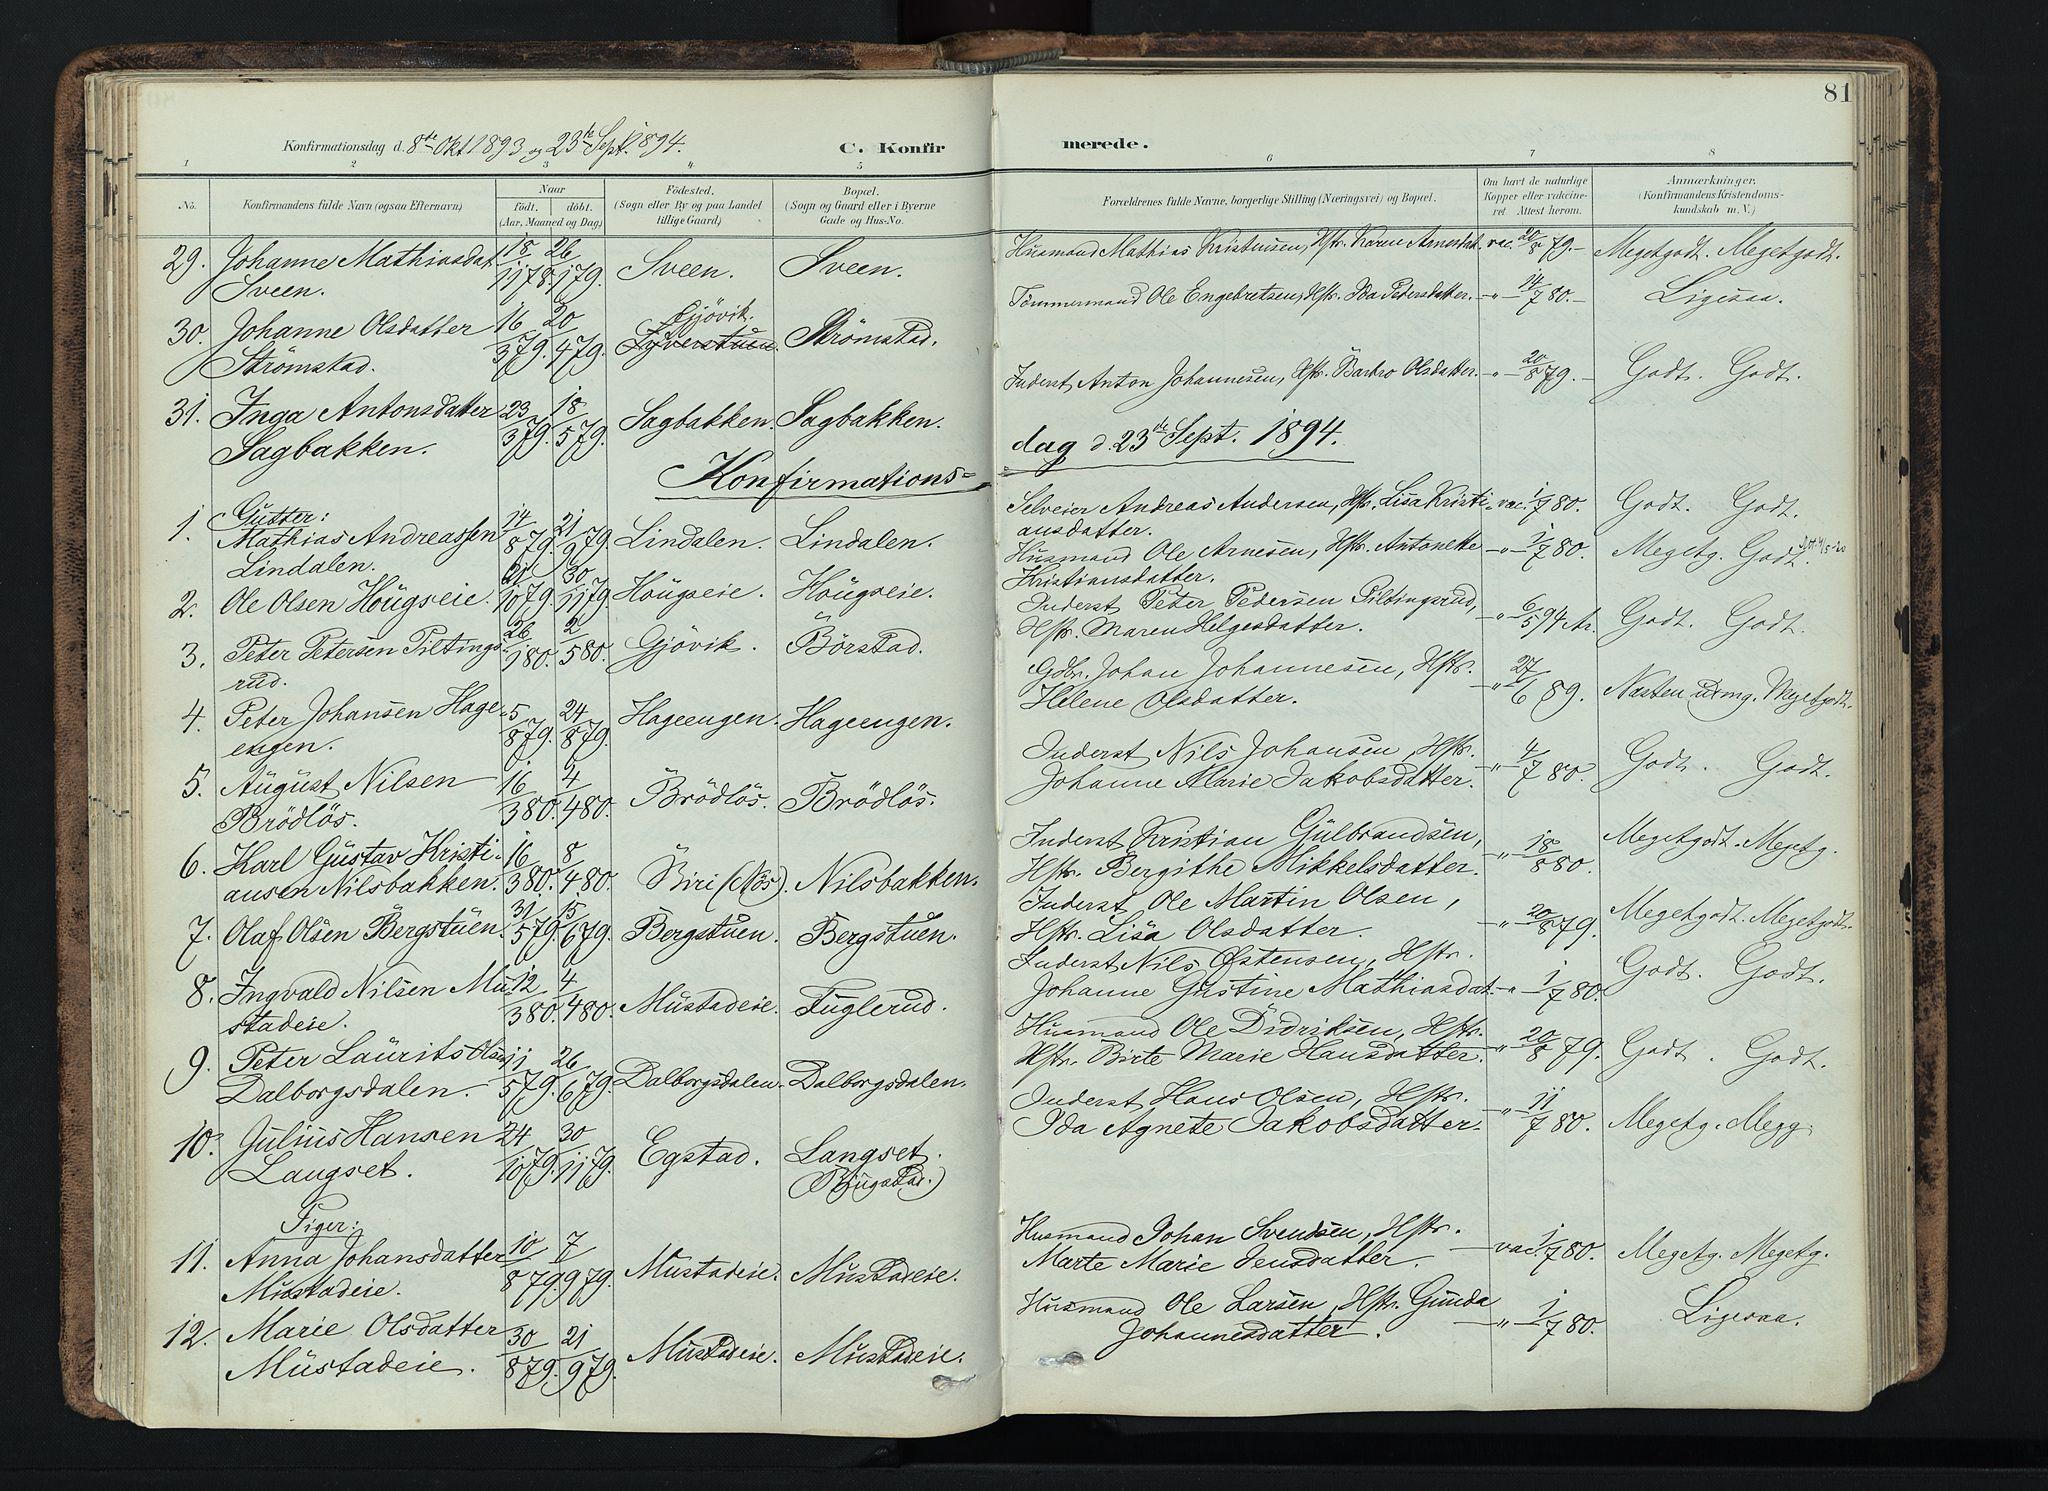 SAH, Vardal prestekontor, H/Ha/Haa/L0019: Ministerialbok nr. 19, 1893-1907, s. 81